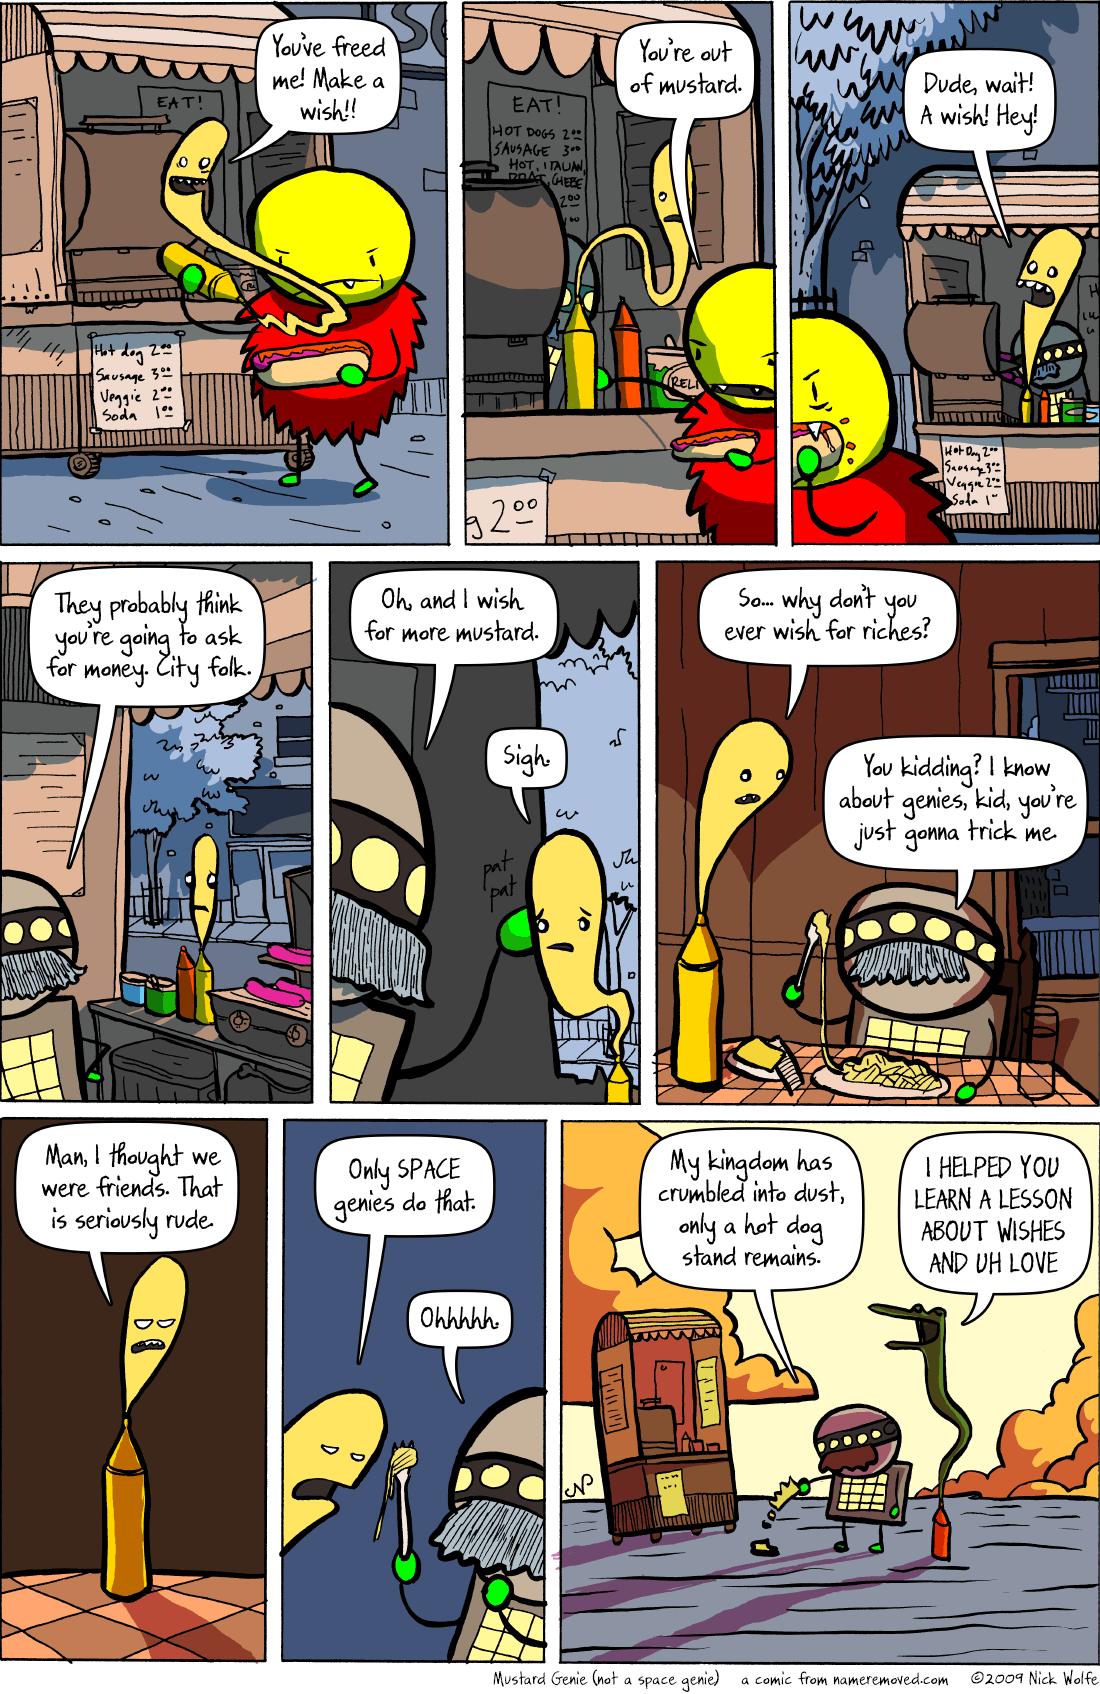 Mustard Genie (not a space genie)